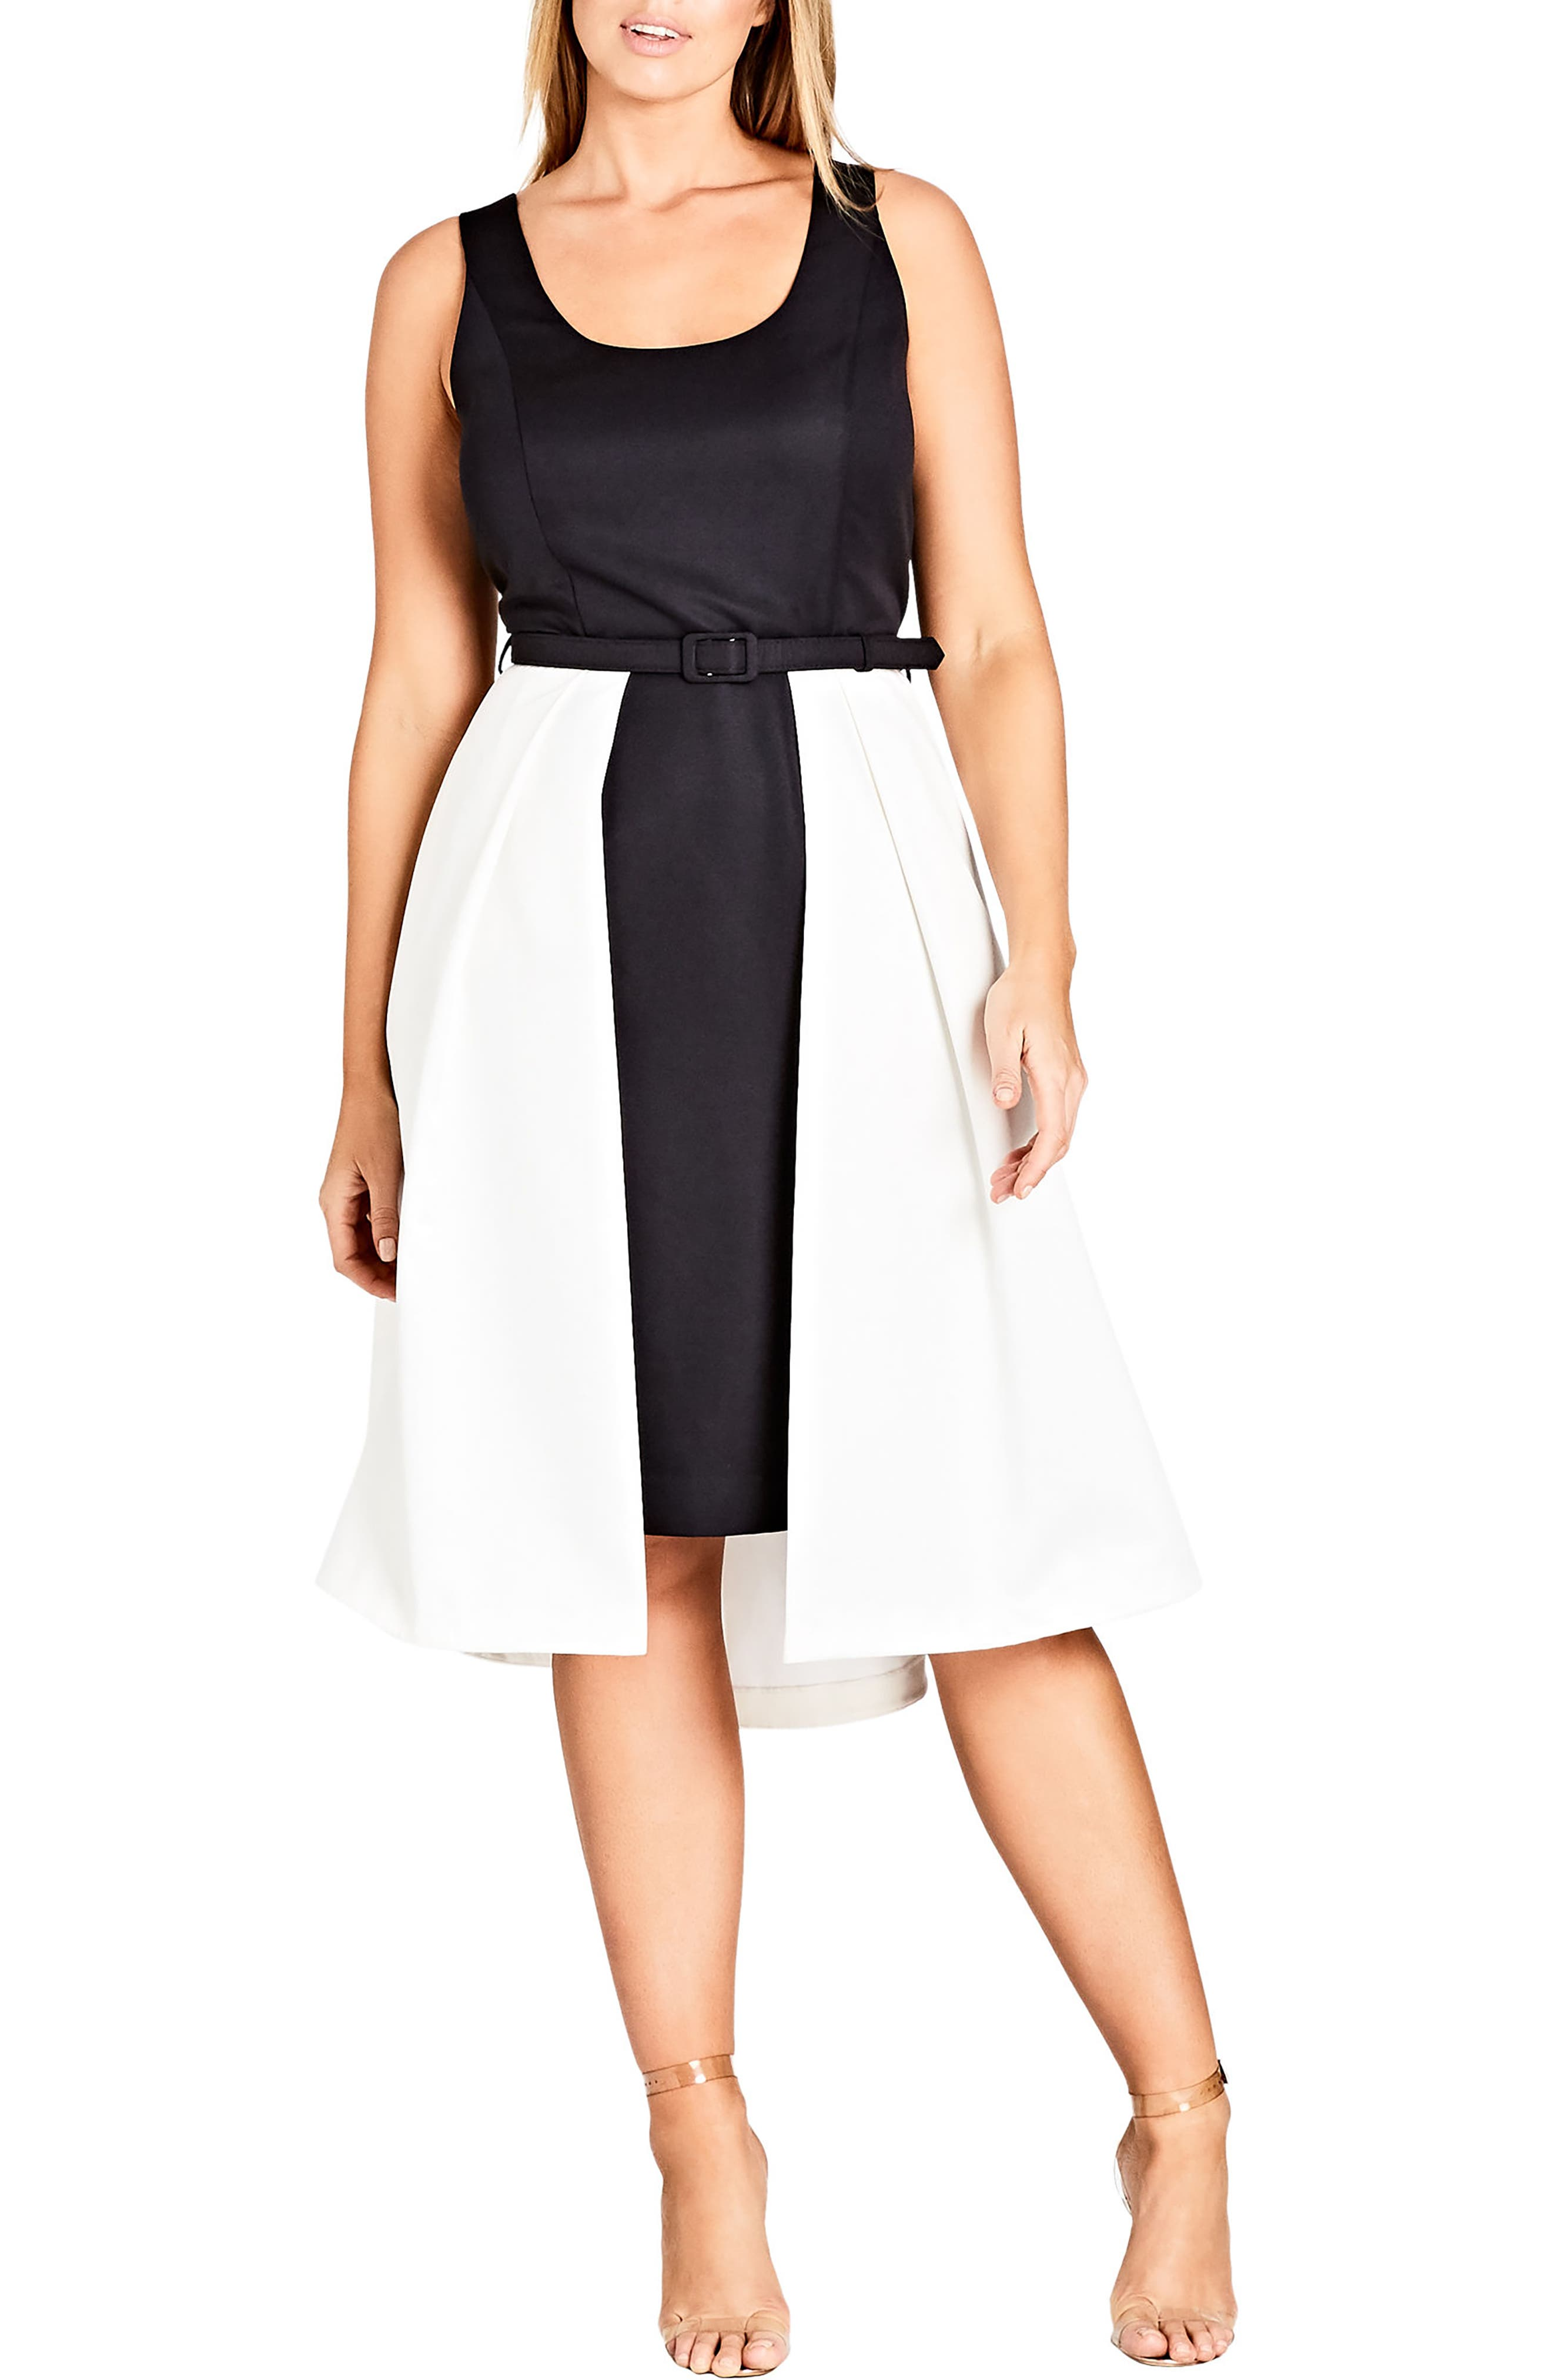 Hepburn Colorblock Dress,                             Main thumbnail 1, color,                             909